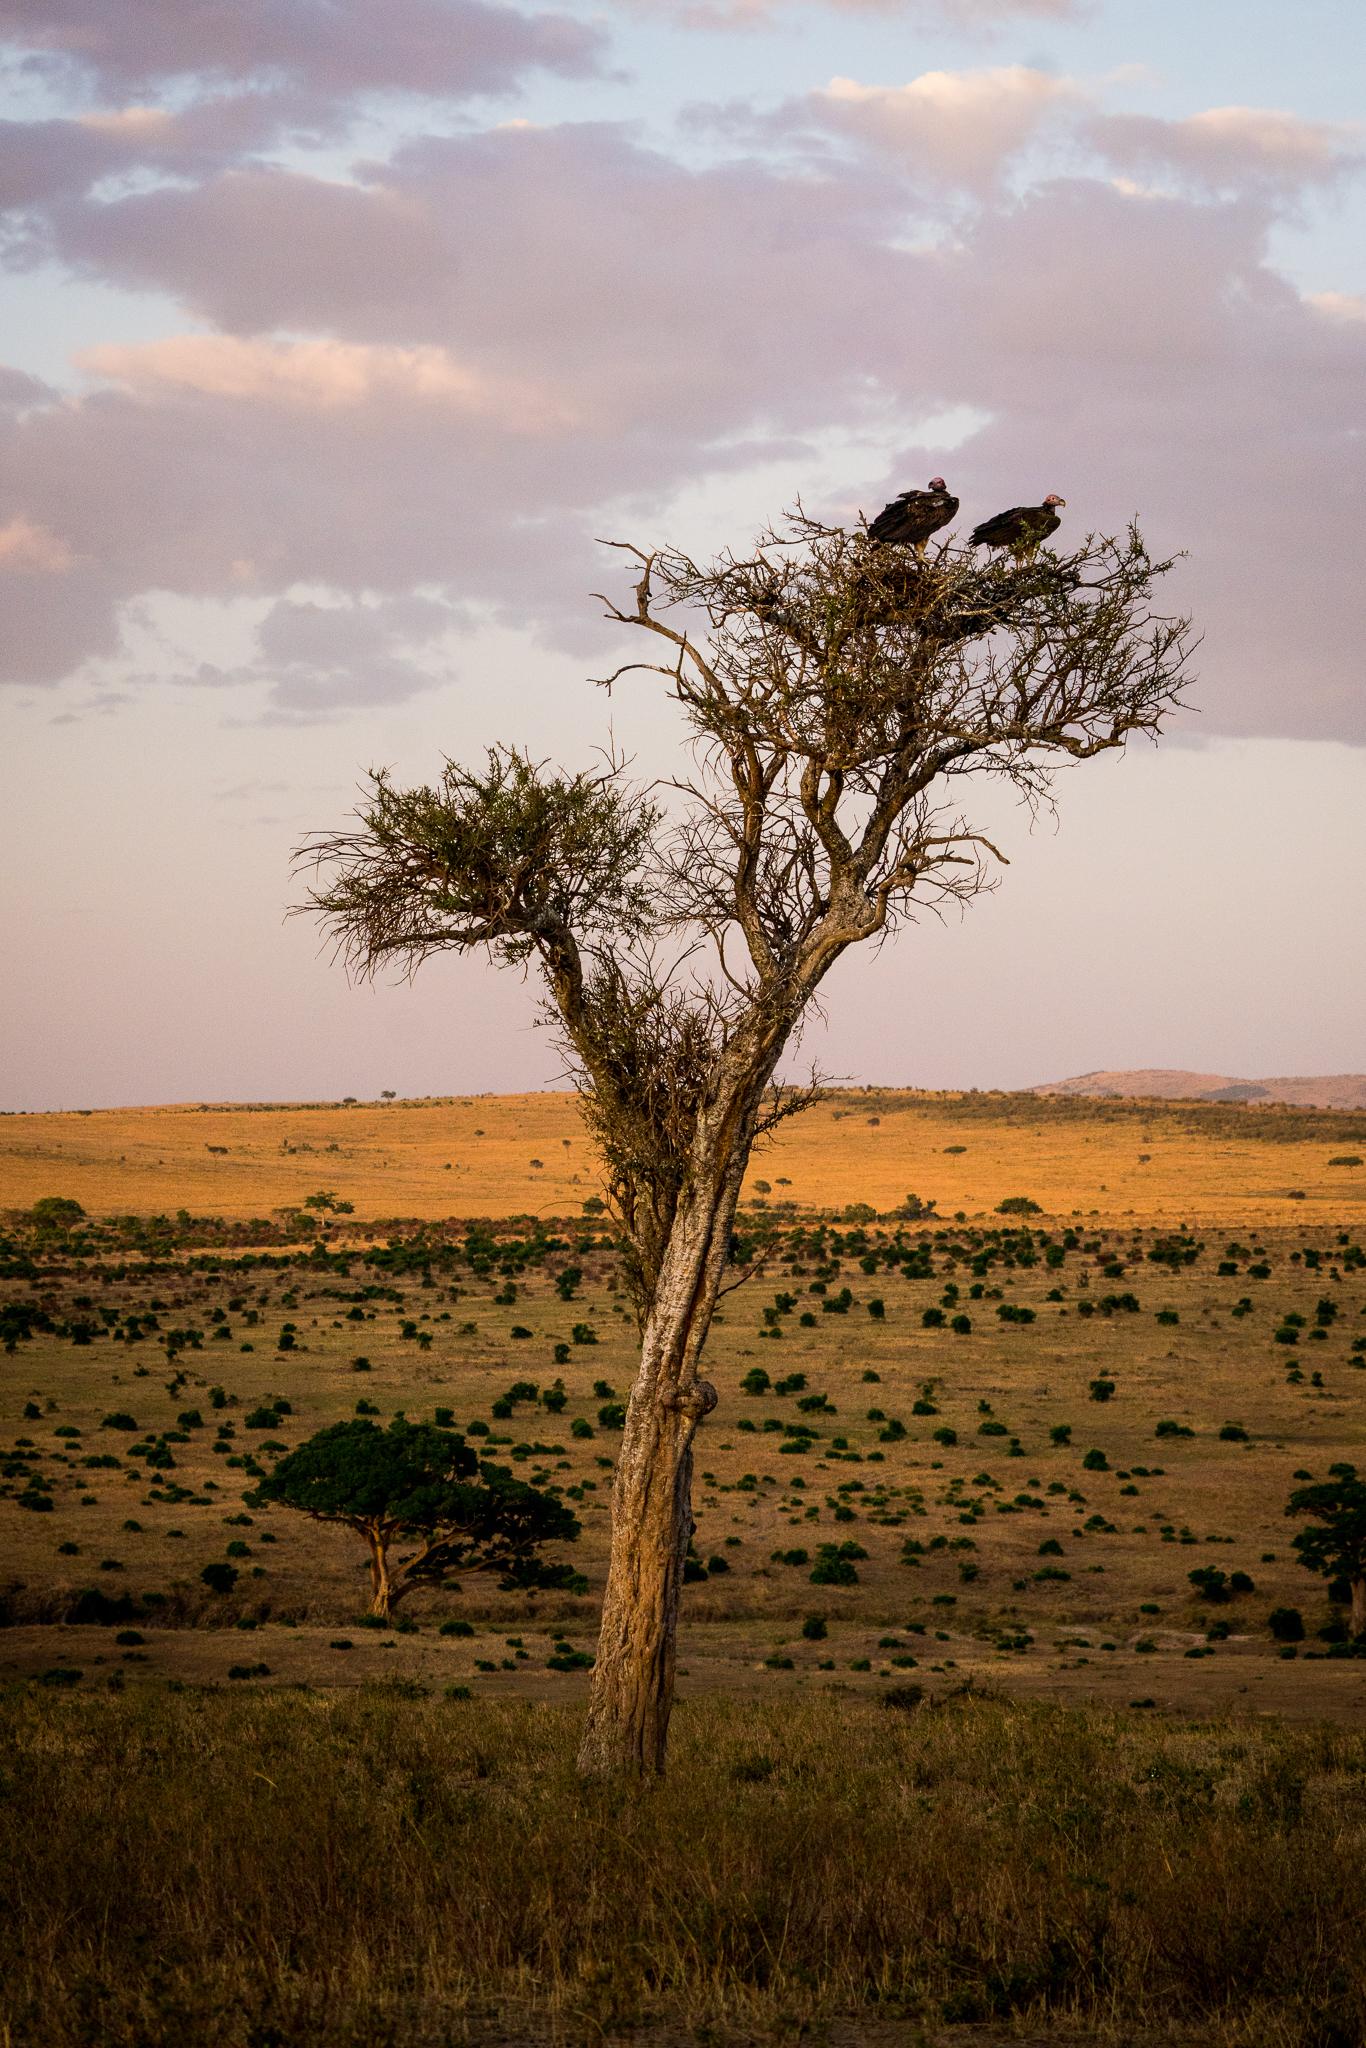 Maasai Mara at Sunset Ph. Dave Krugman